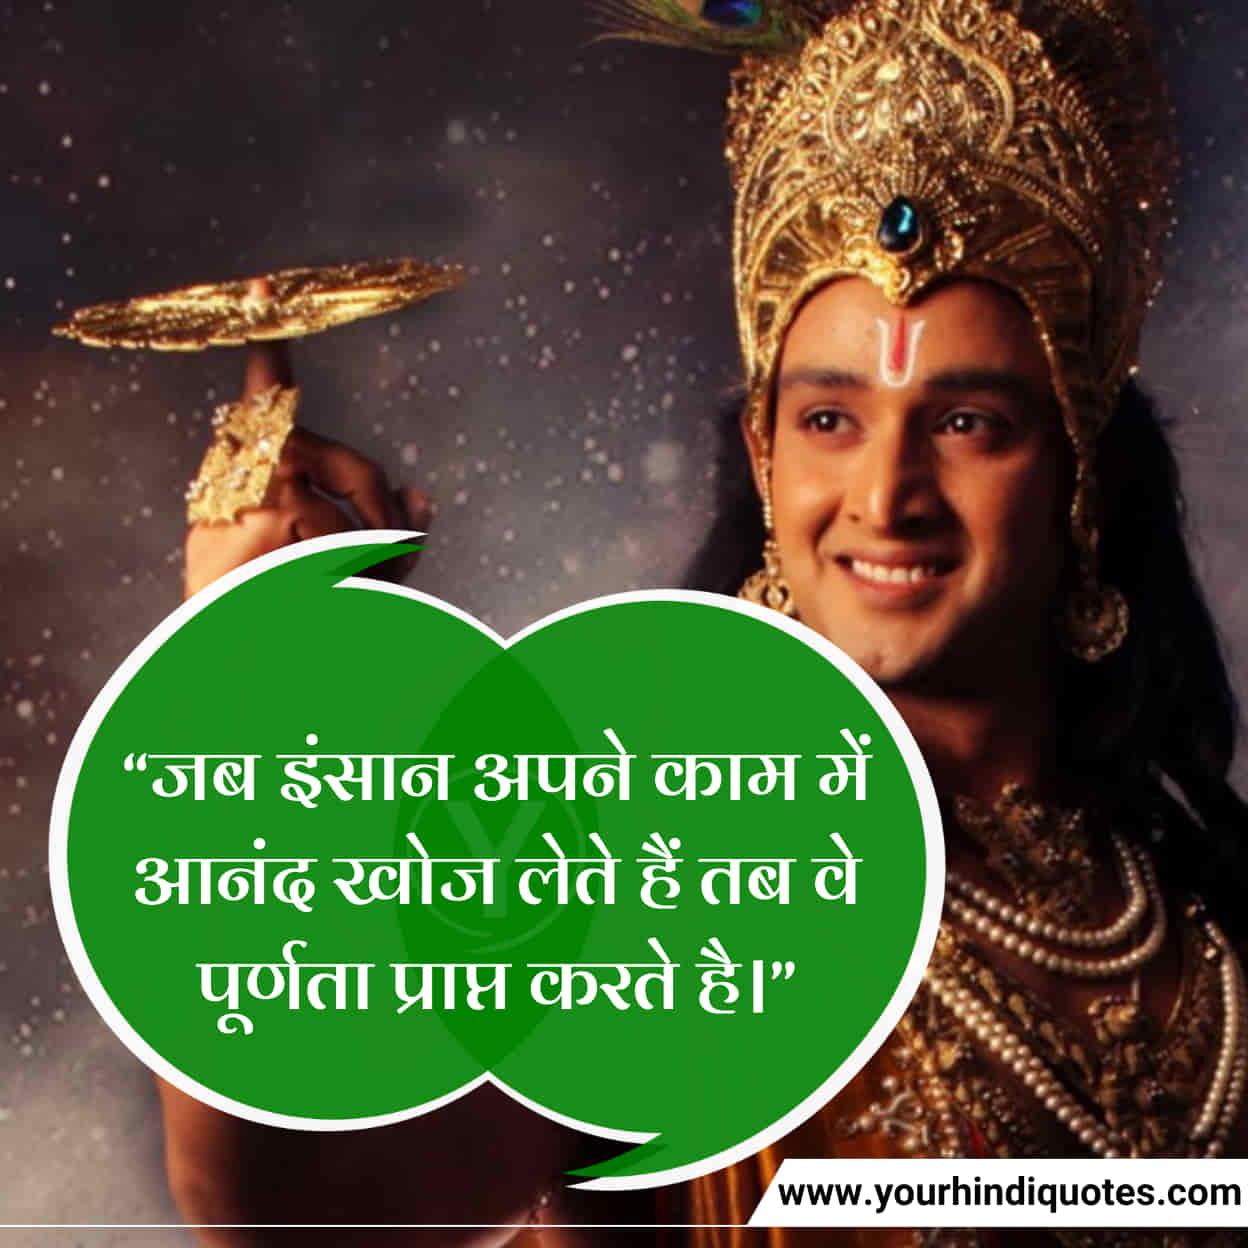 Shrimad Bhagwat Gita Hindi Success Quotes